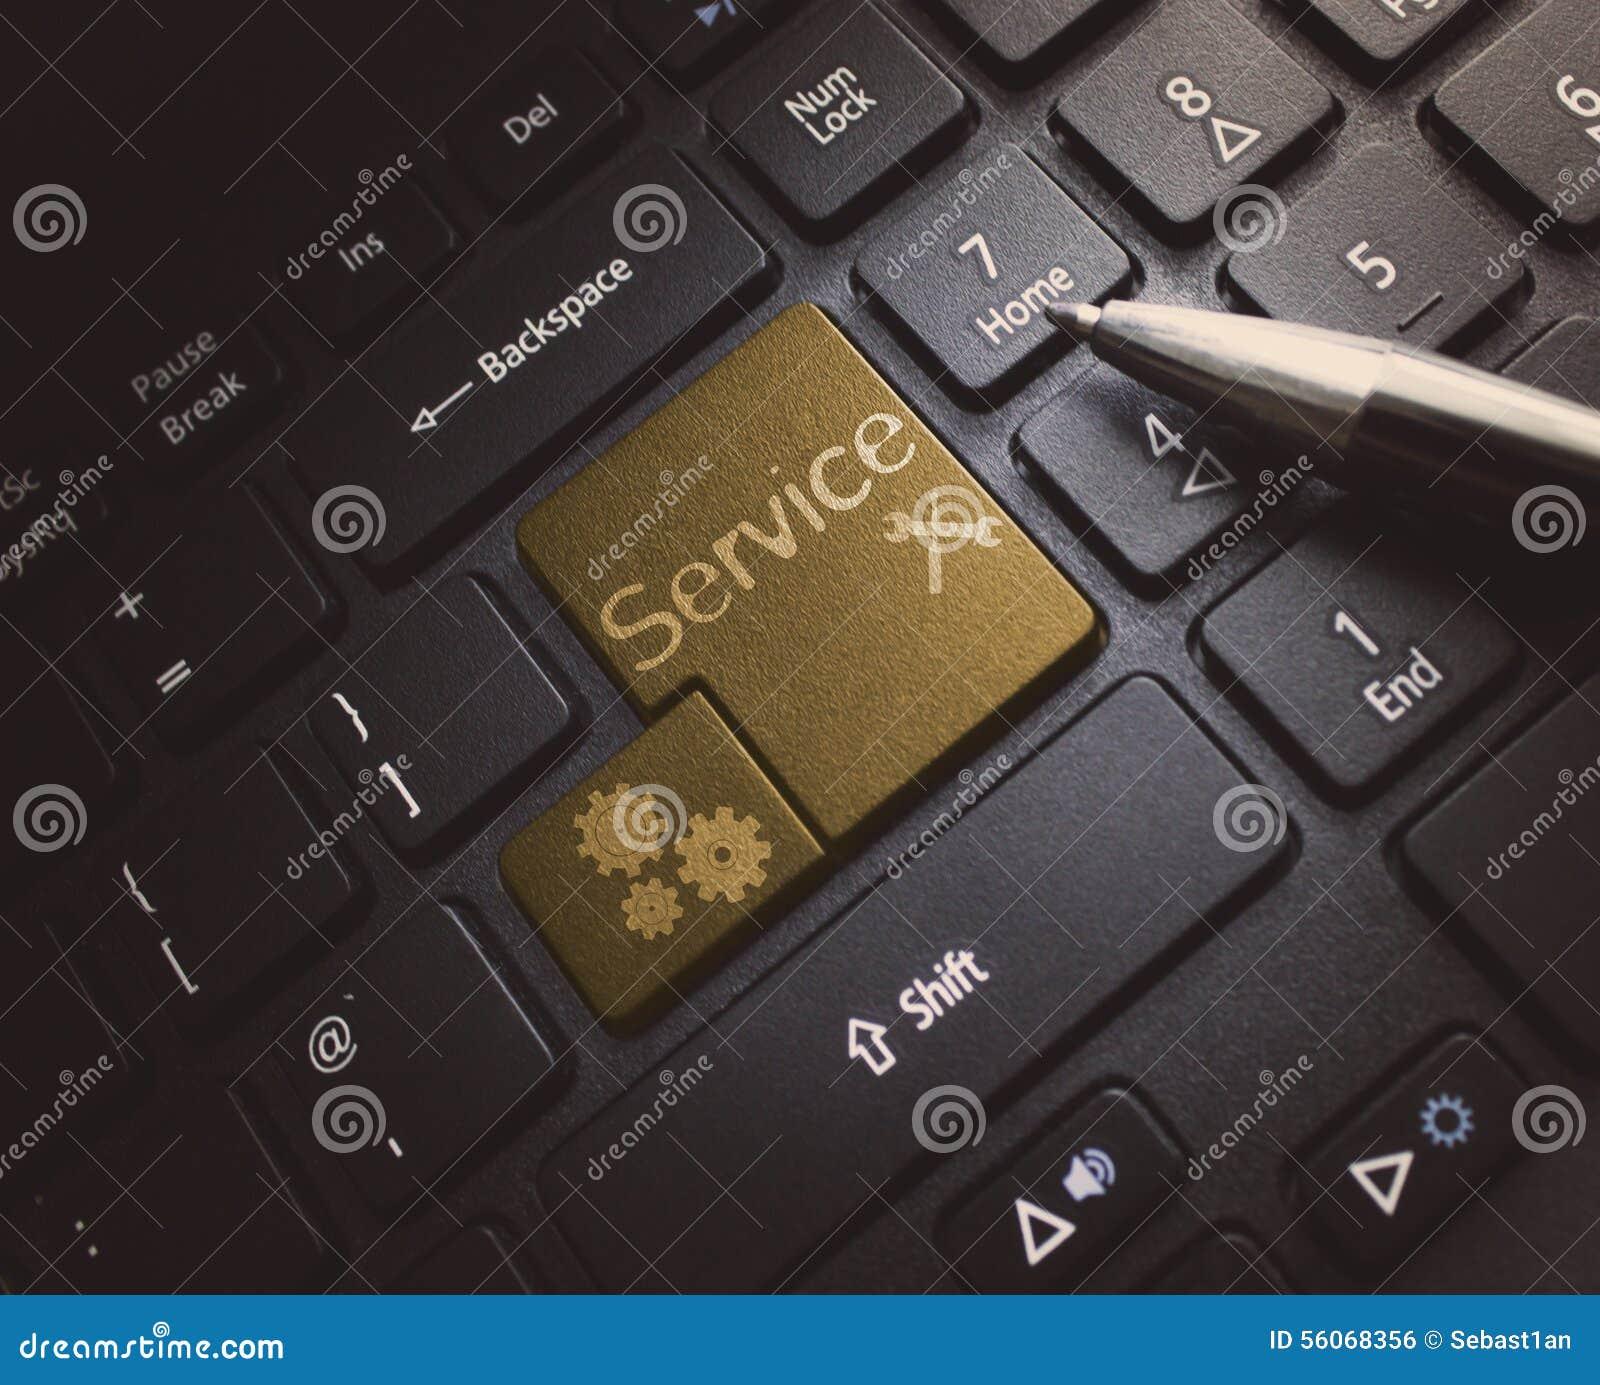 Обслуживайте клавиатуру